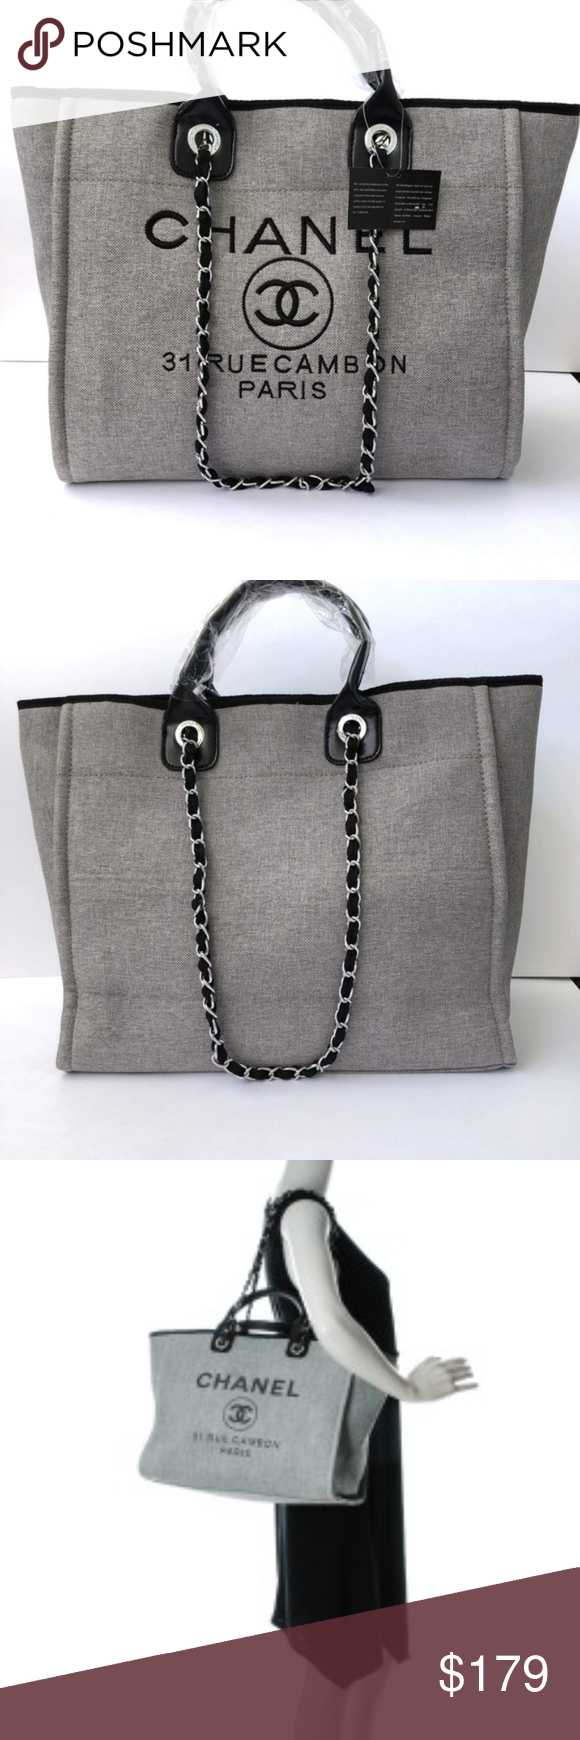 fed45381517b83 Spotted while shopping on Poshmark: Chanel Canvas Tote Bag Shoulder Bag VIP  NEW Grey! #poshmark #fashion #shopping #style #C H A N E L #Handbags